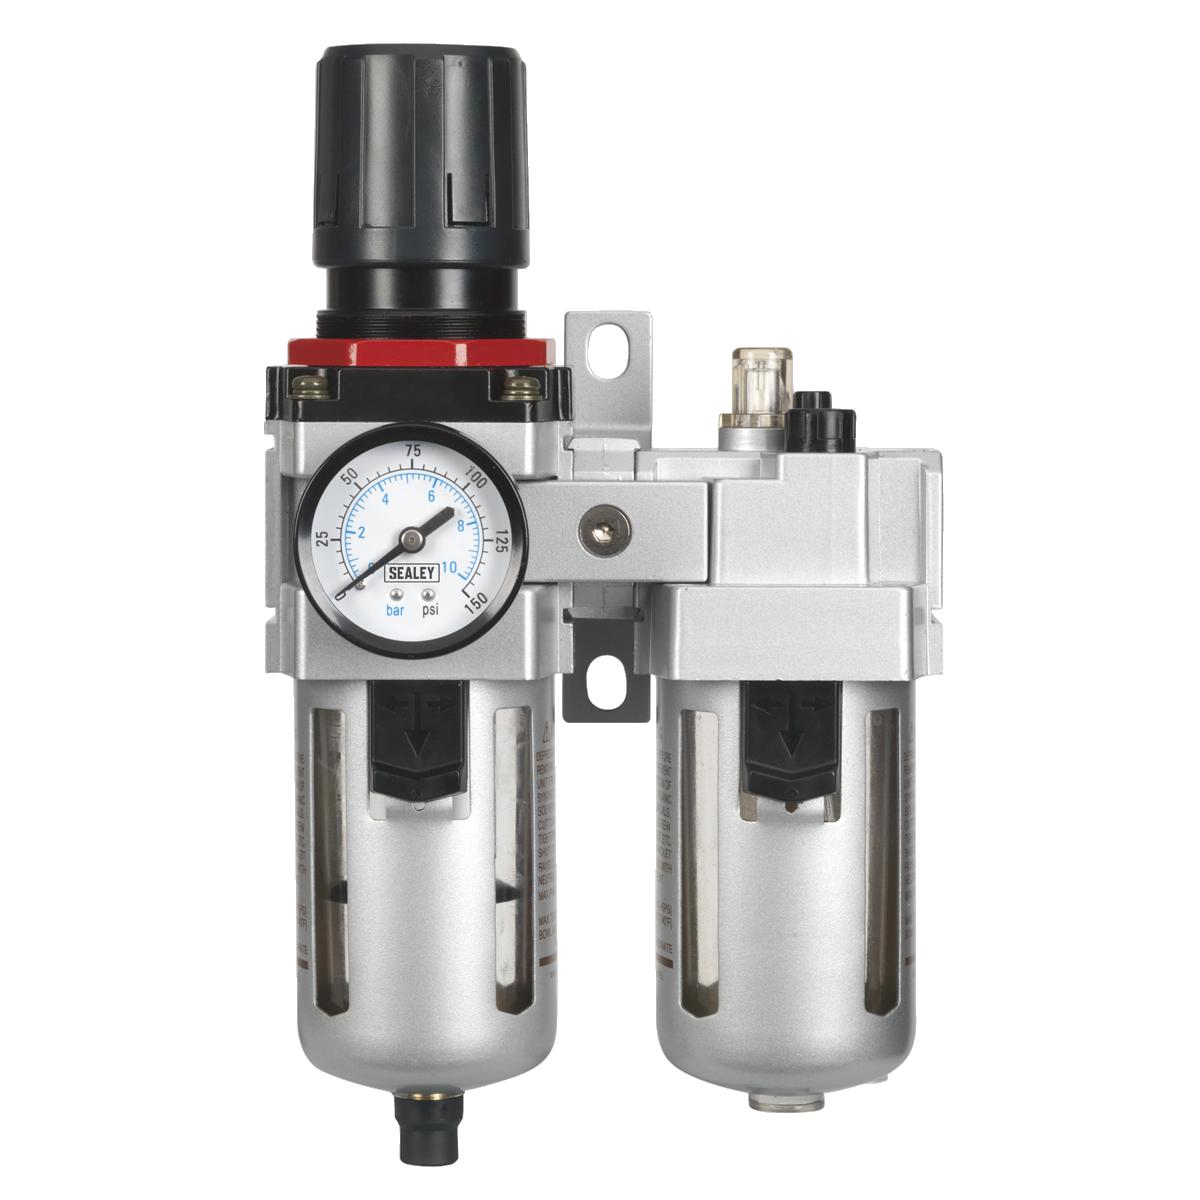 Air Filter/Regulator/Lubricator - High Flow